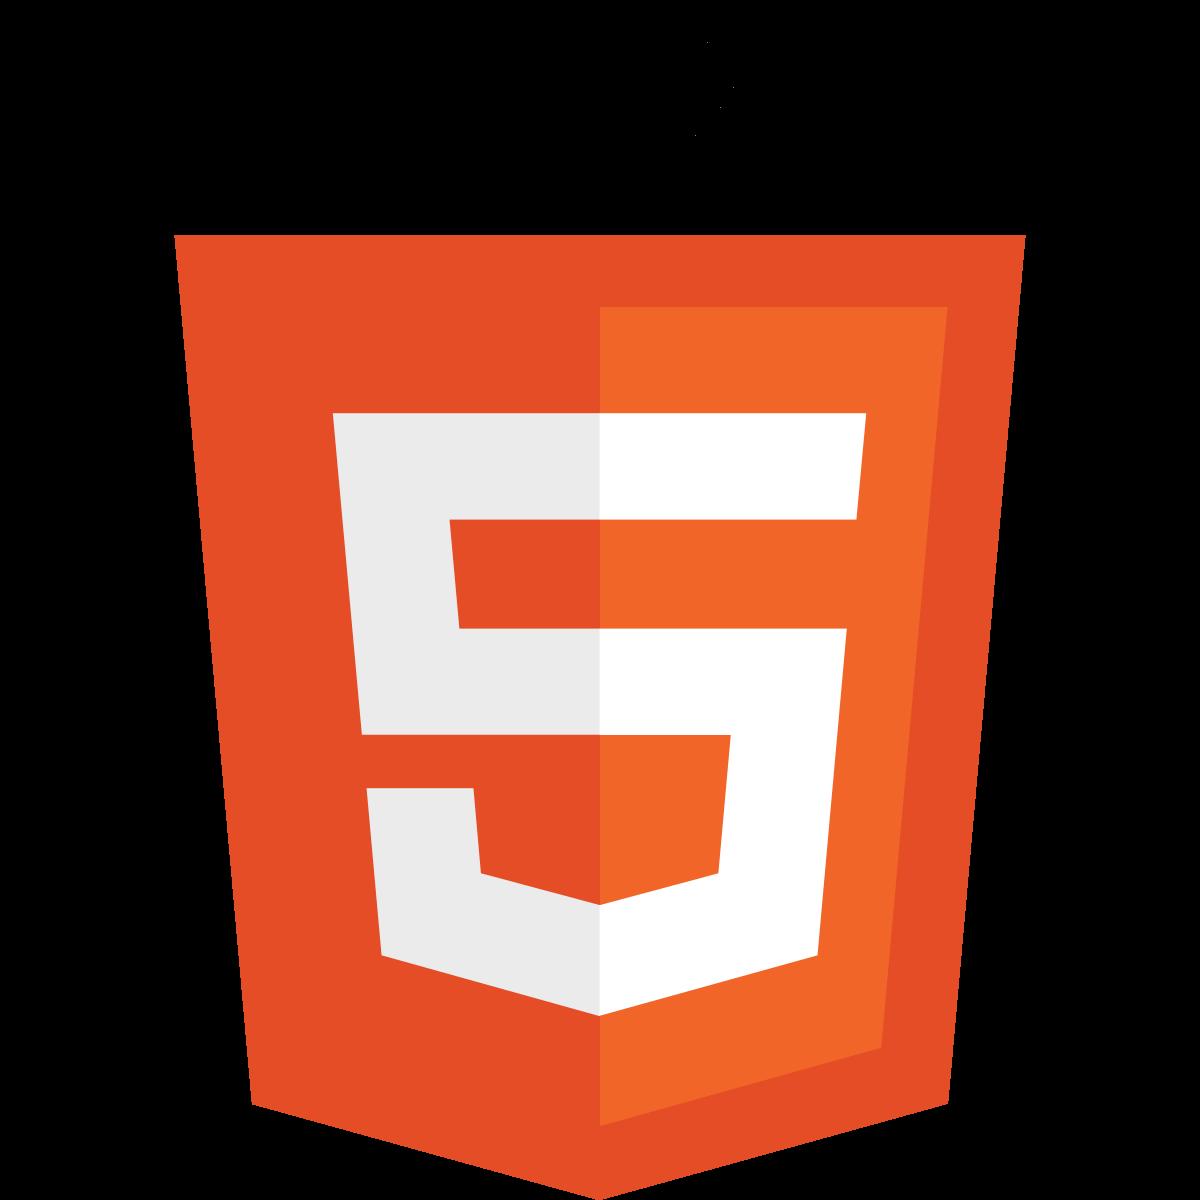 اچ تی ام ال5  HTML5